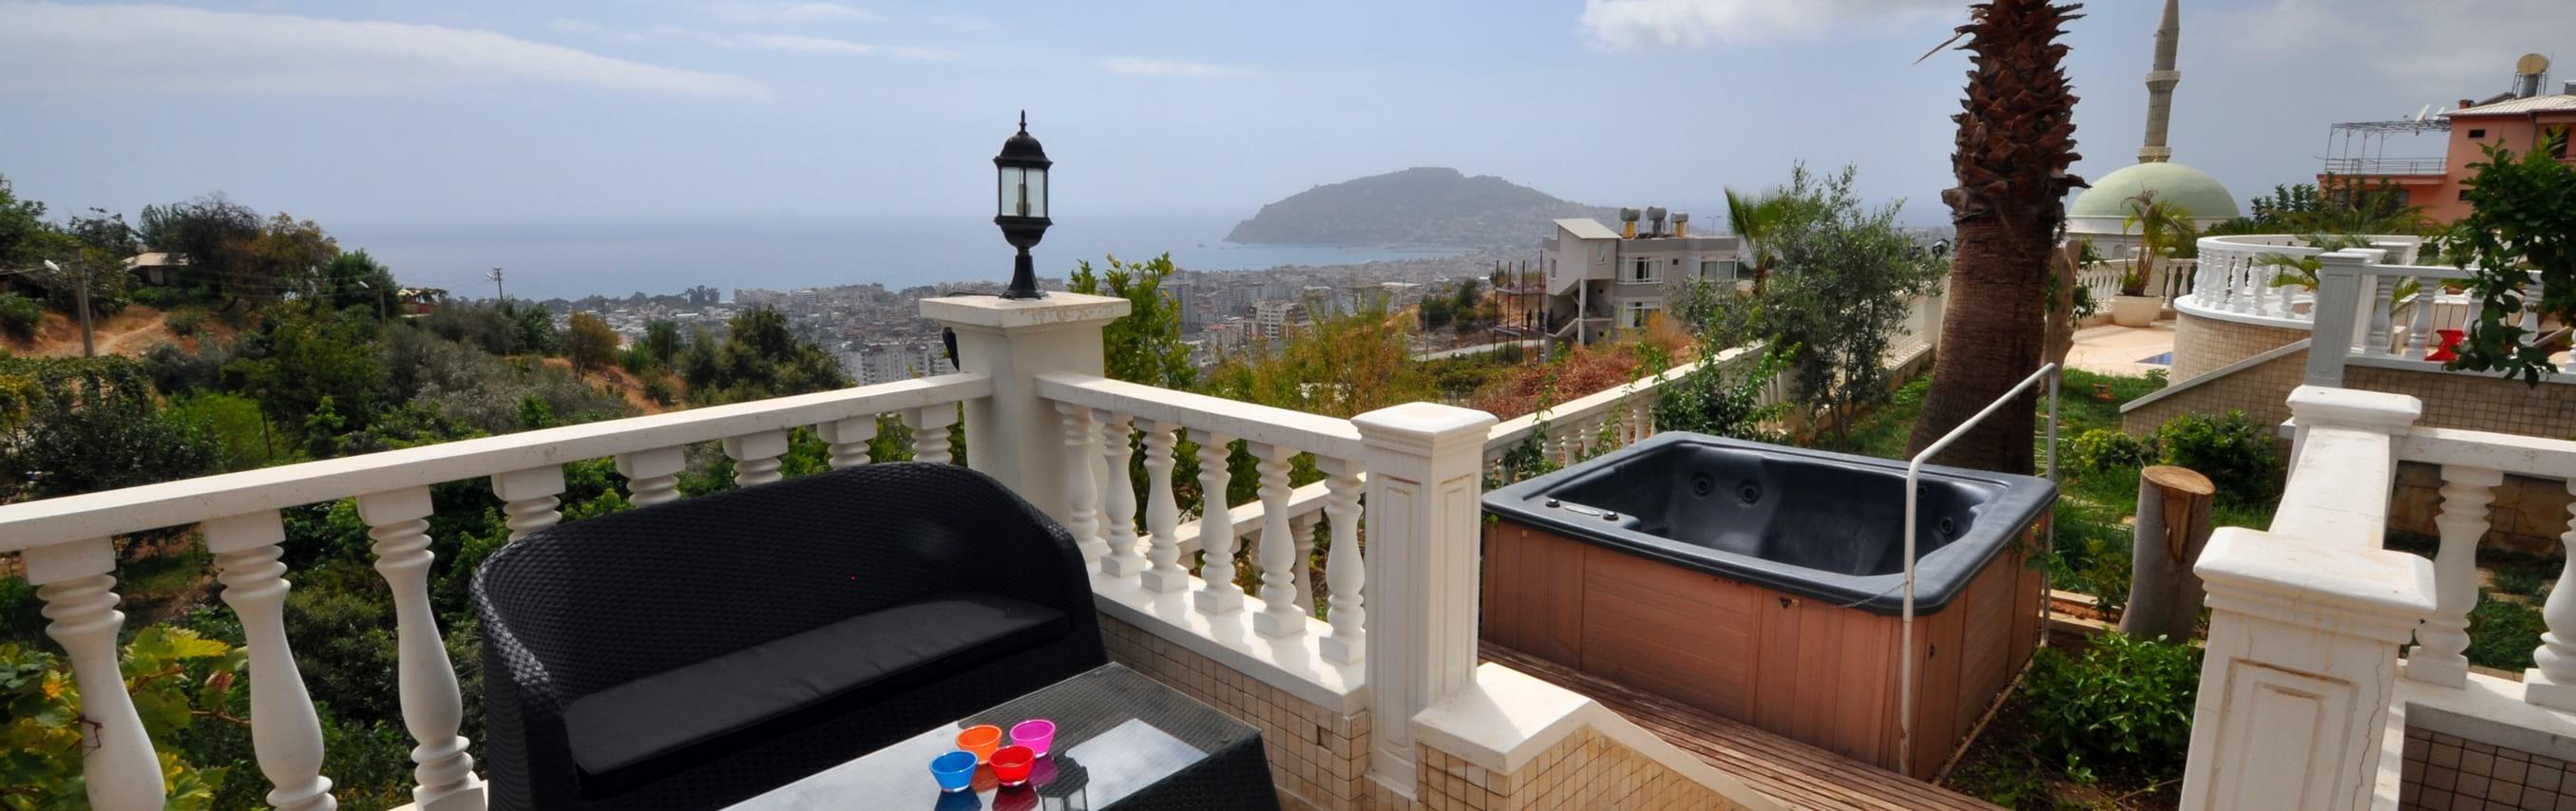 Oasis View villa